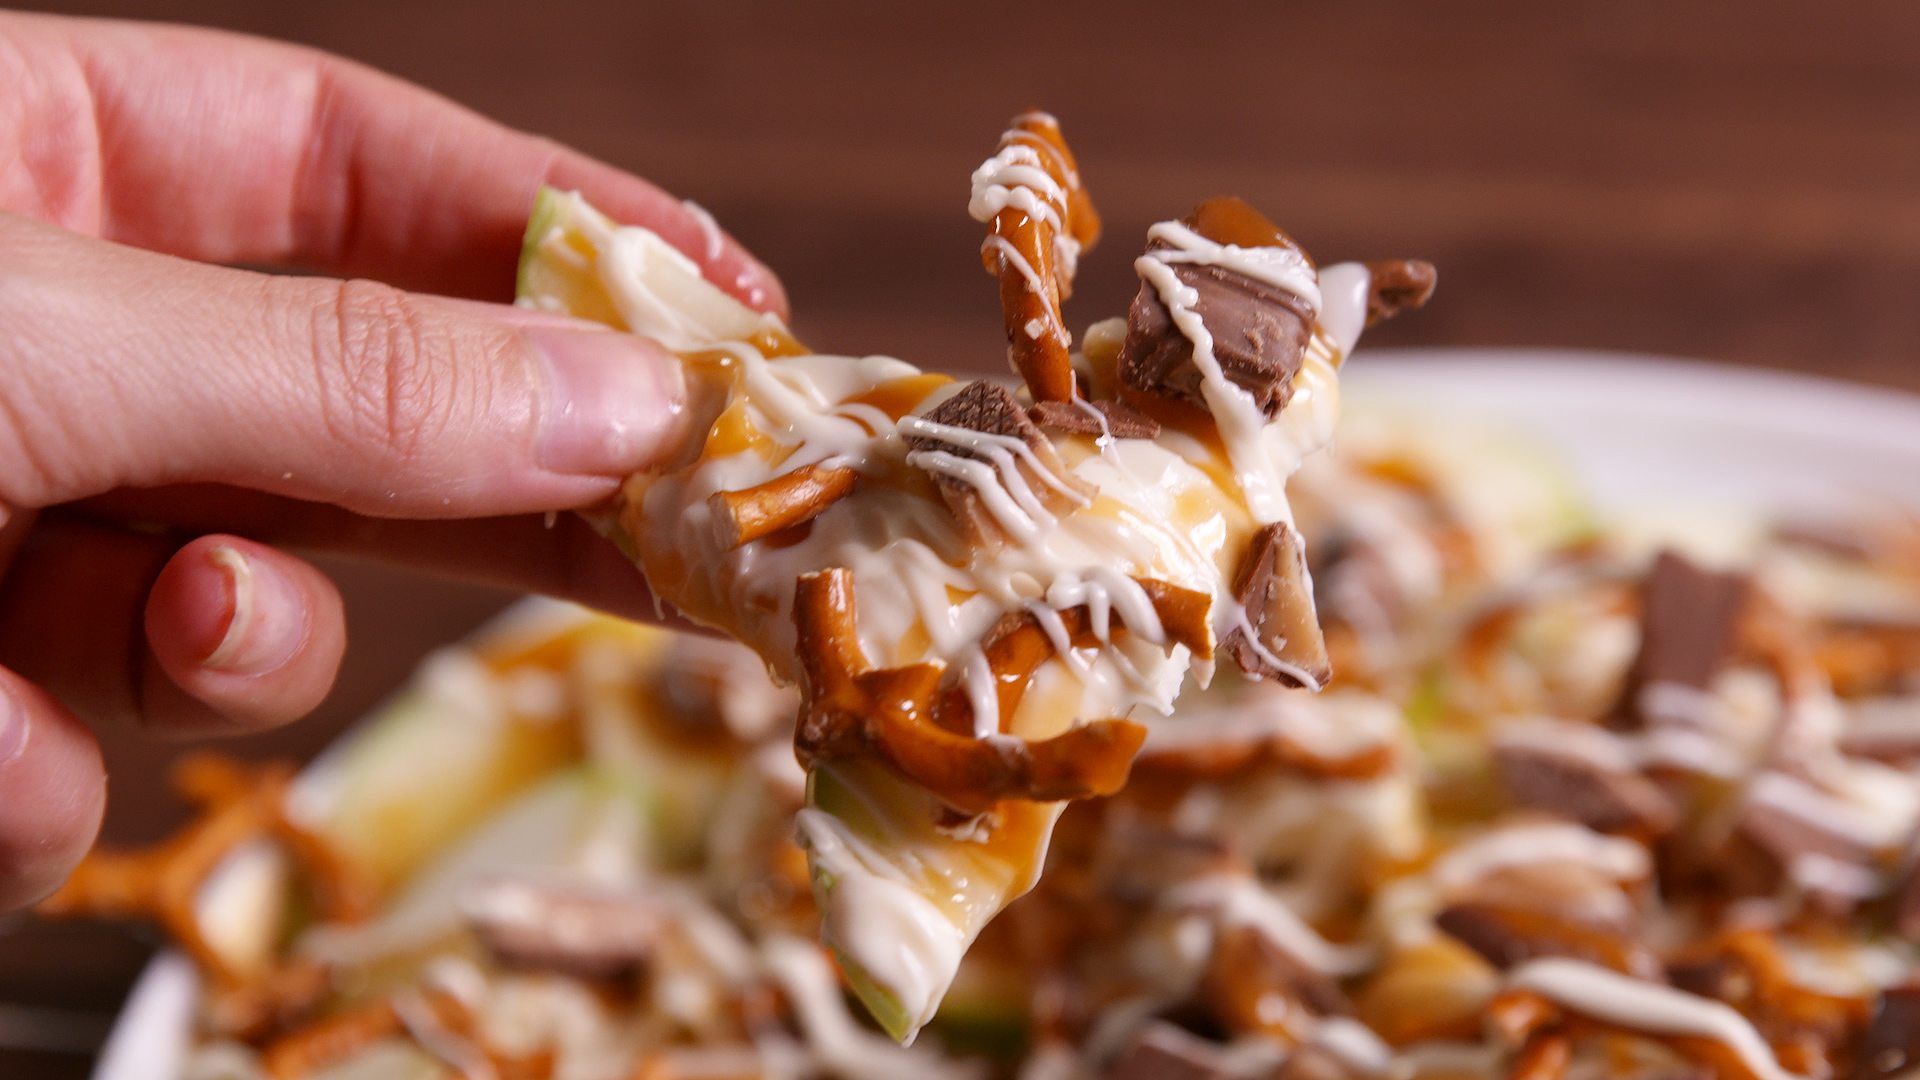 How to Make Apple Nachos